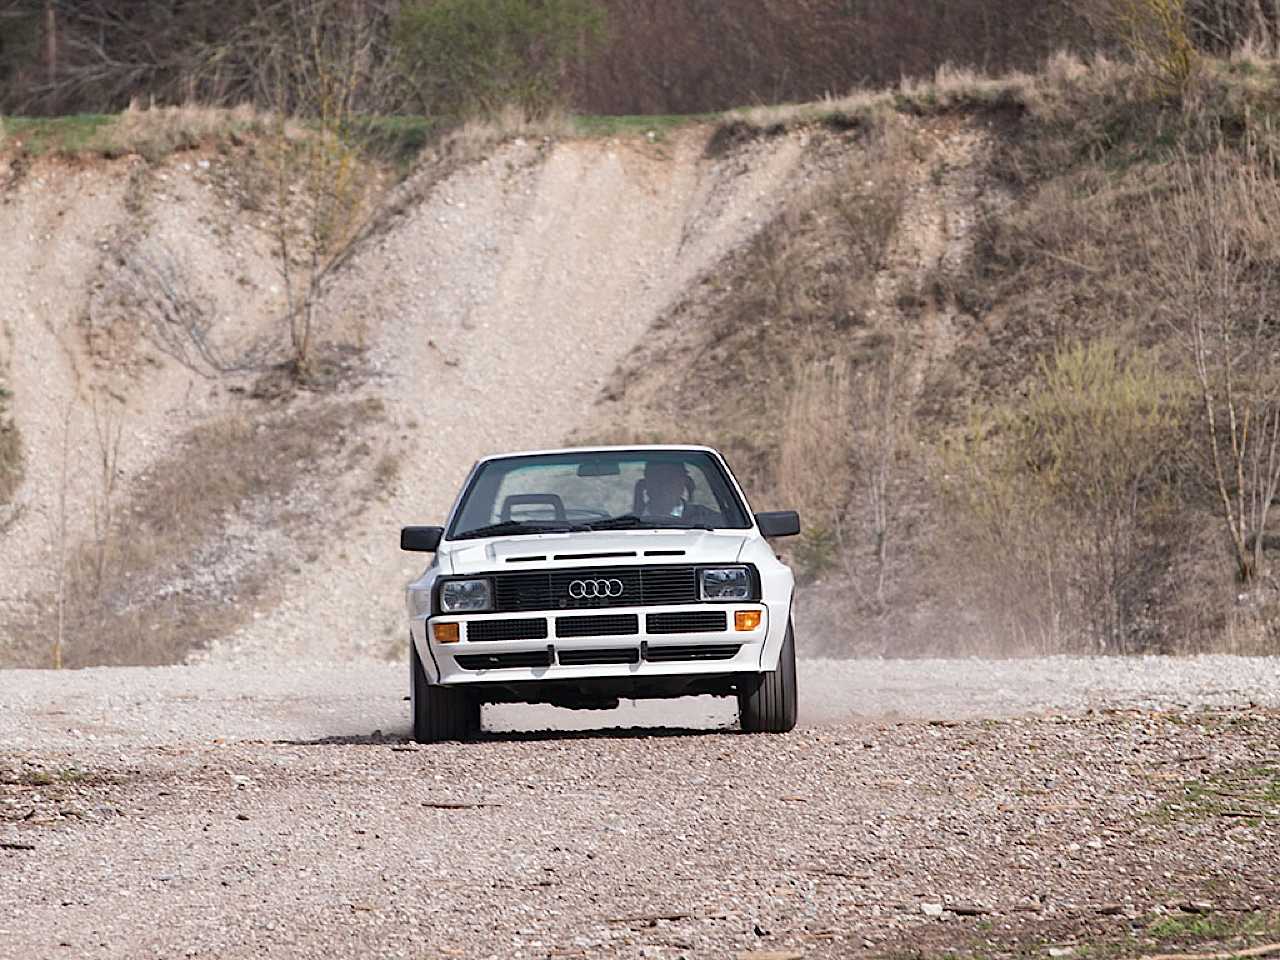 Audi Quattro Sport - Châssis court, turbo et muscu ! 22